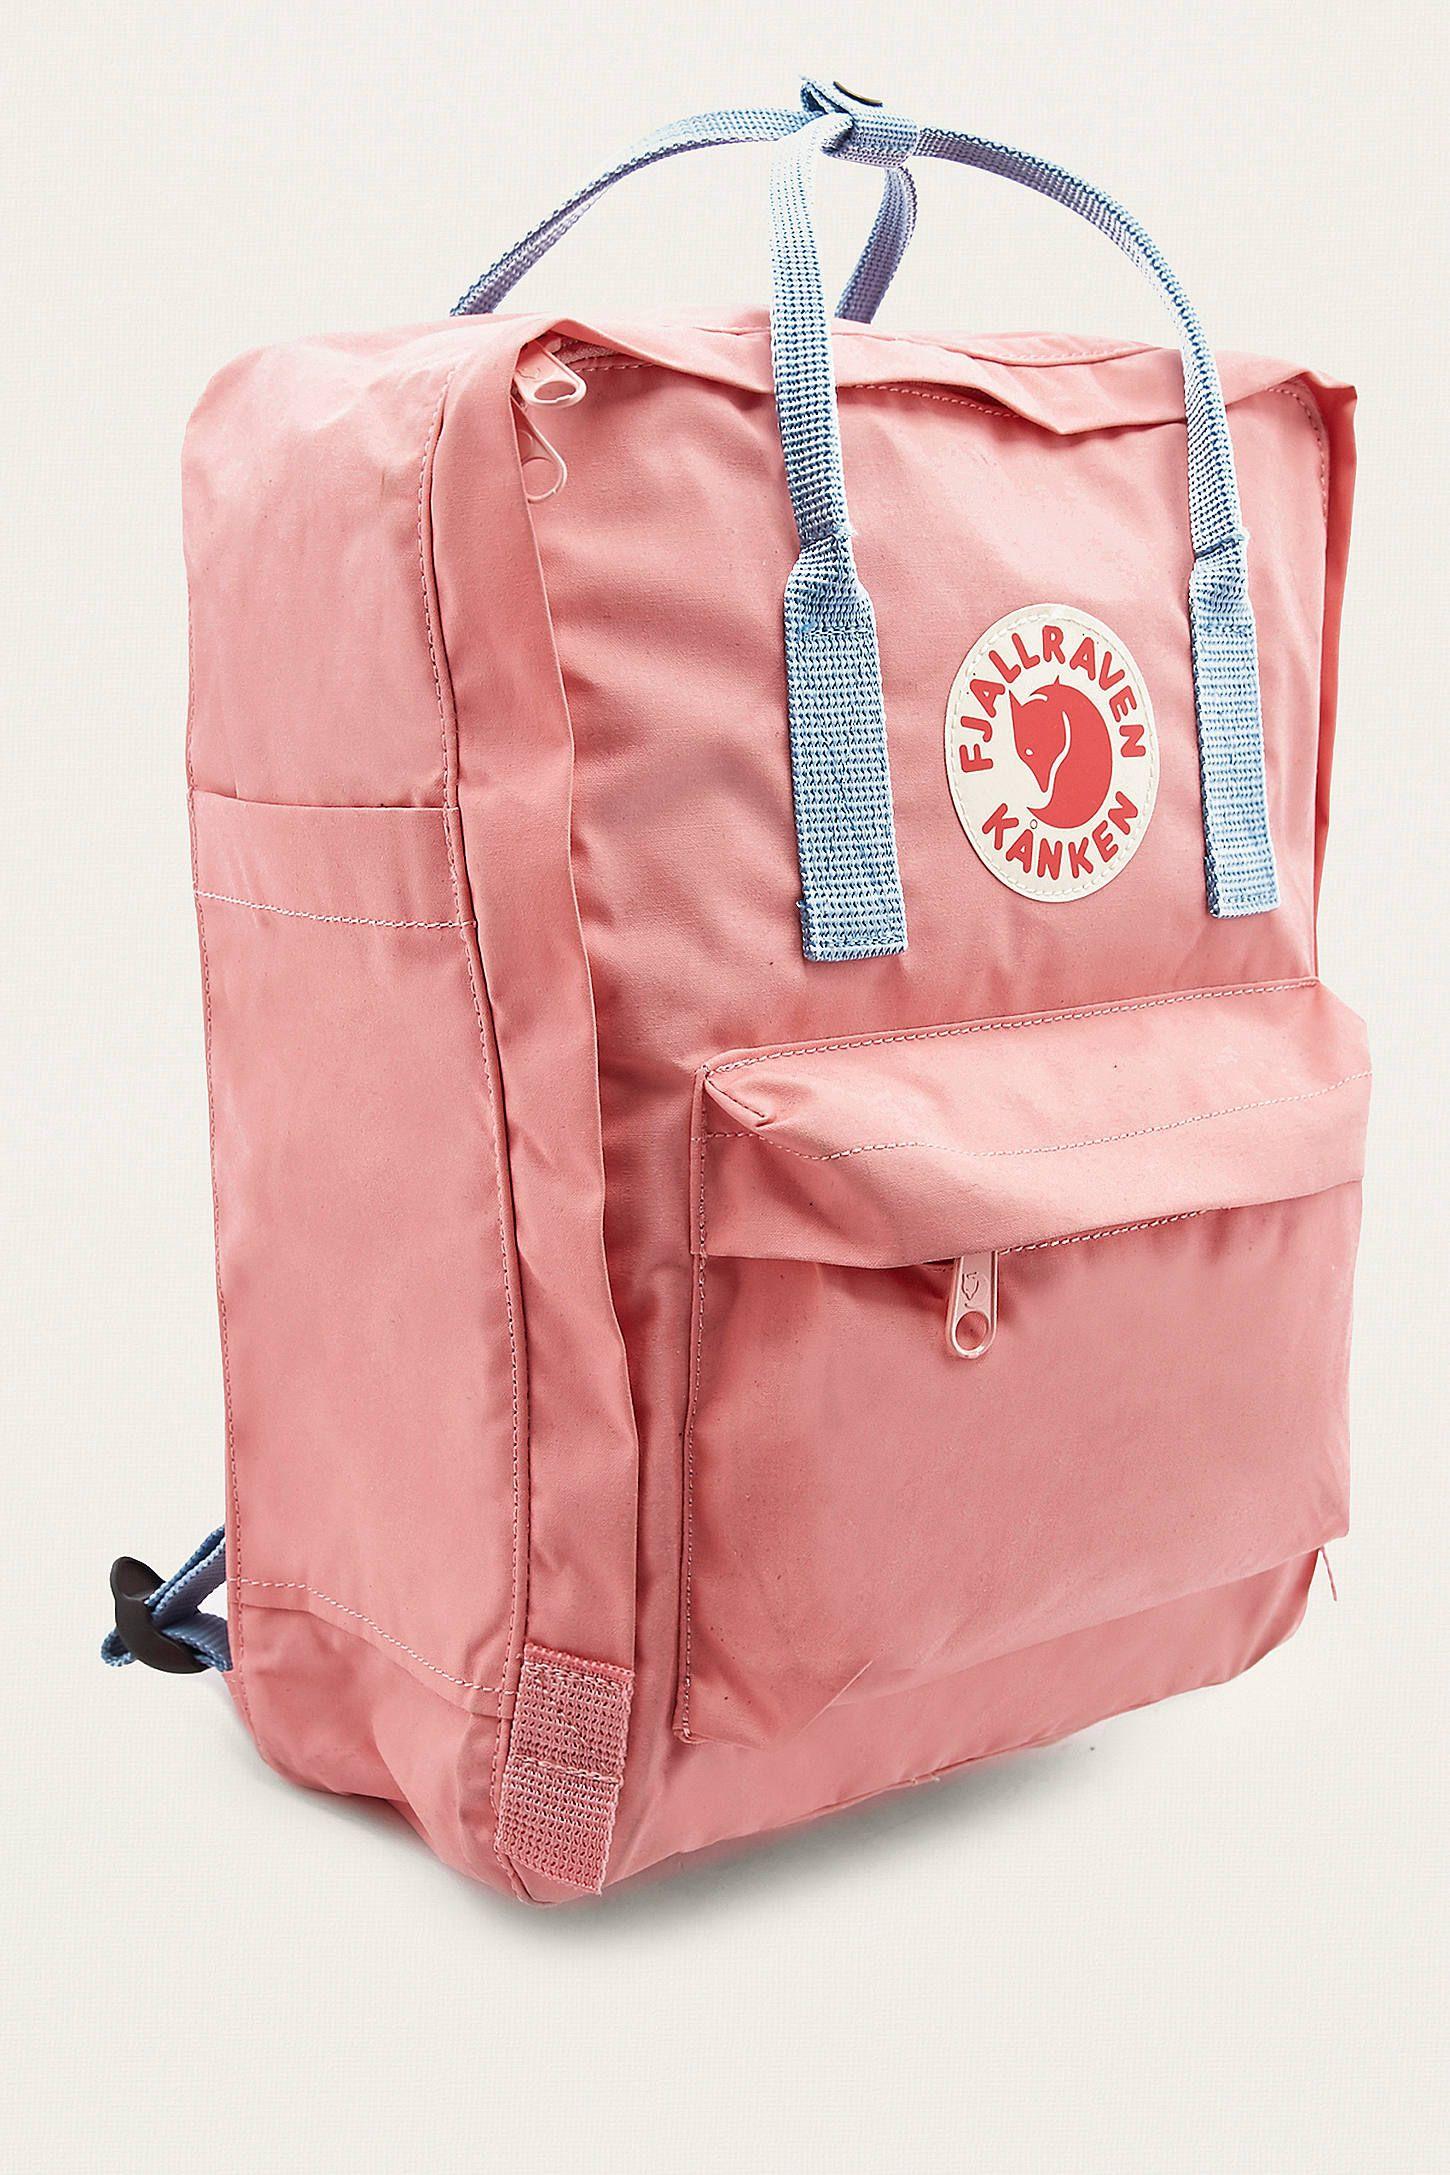 f90b0ccd30f Slide View  3  Fjallraven Kanken Pink And Air Blue Backpack